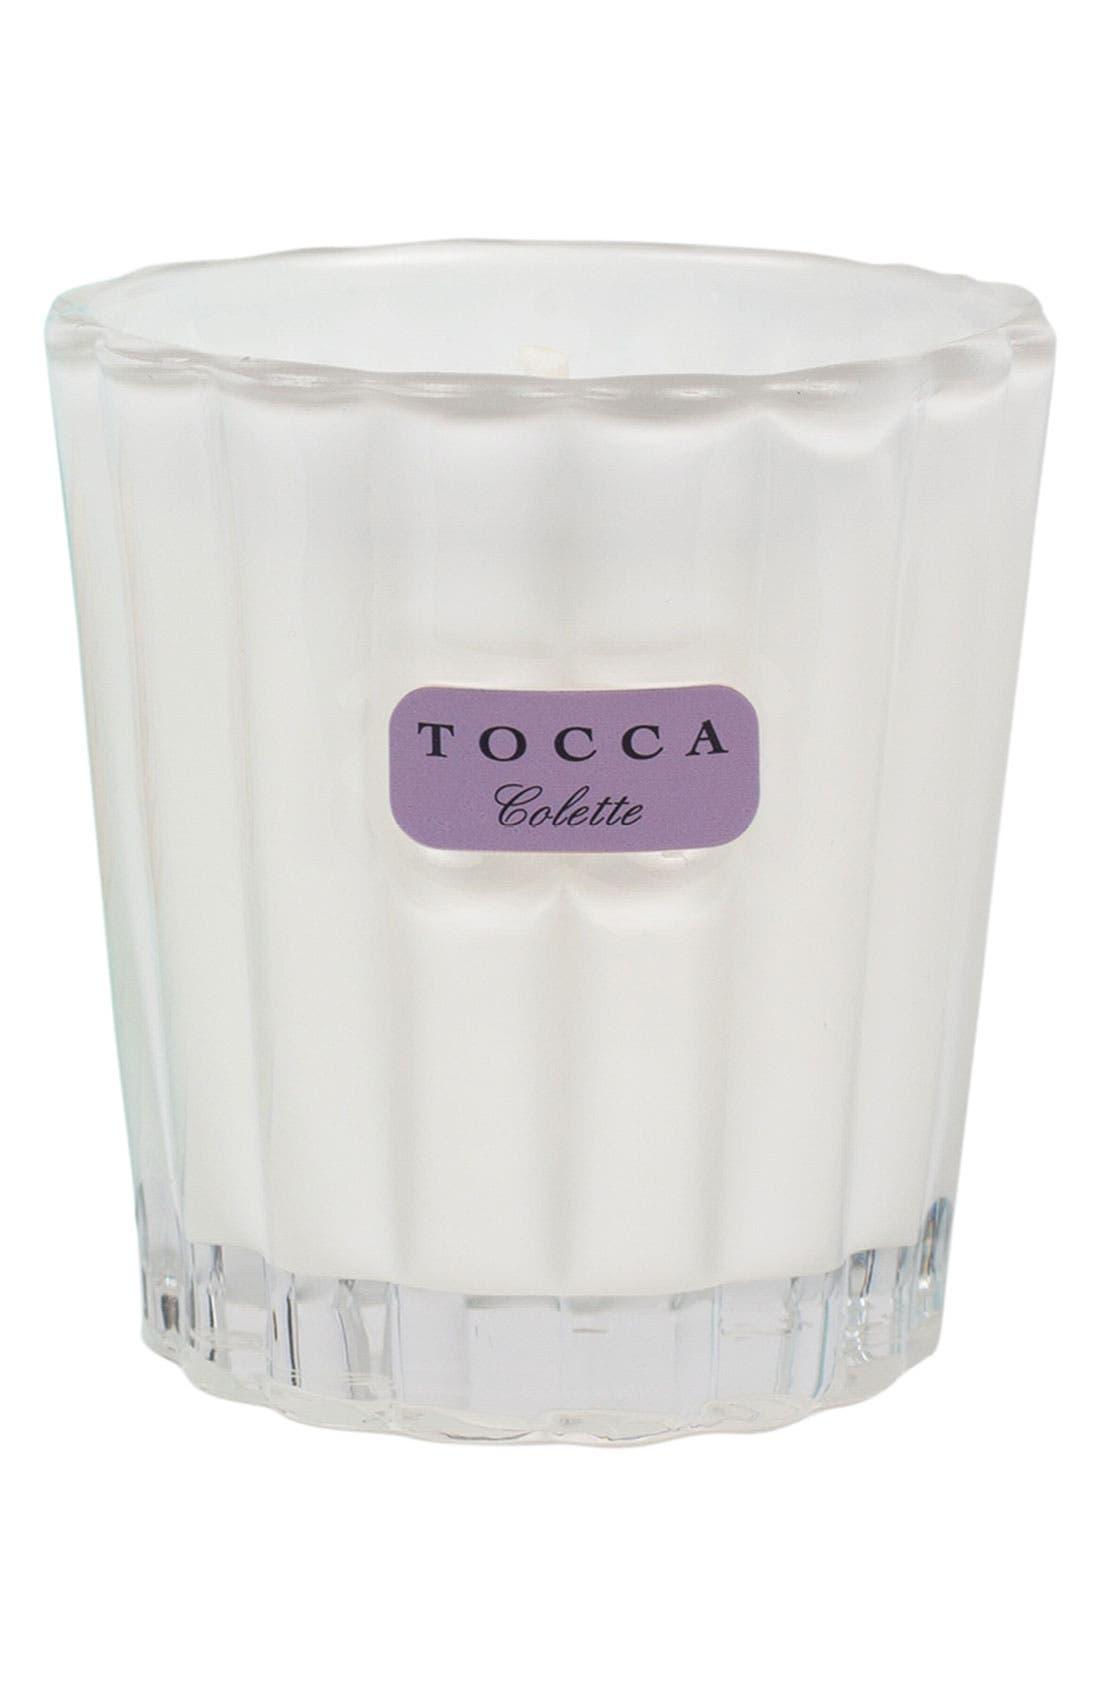 Main Image - TOCCA 'Colette' Candelina